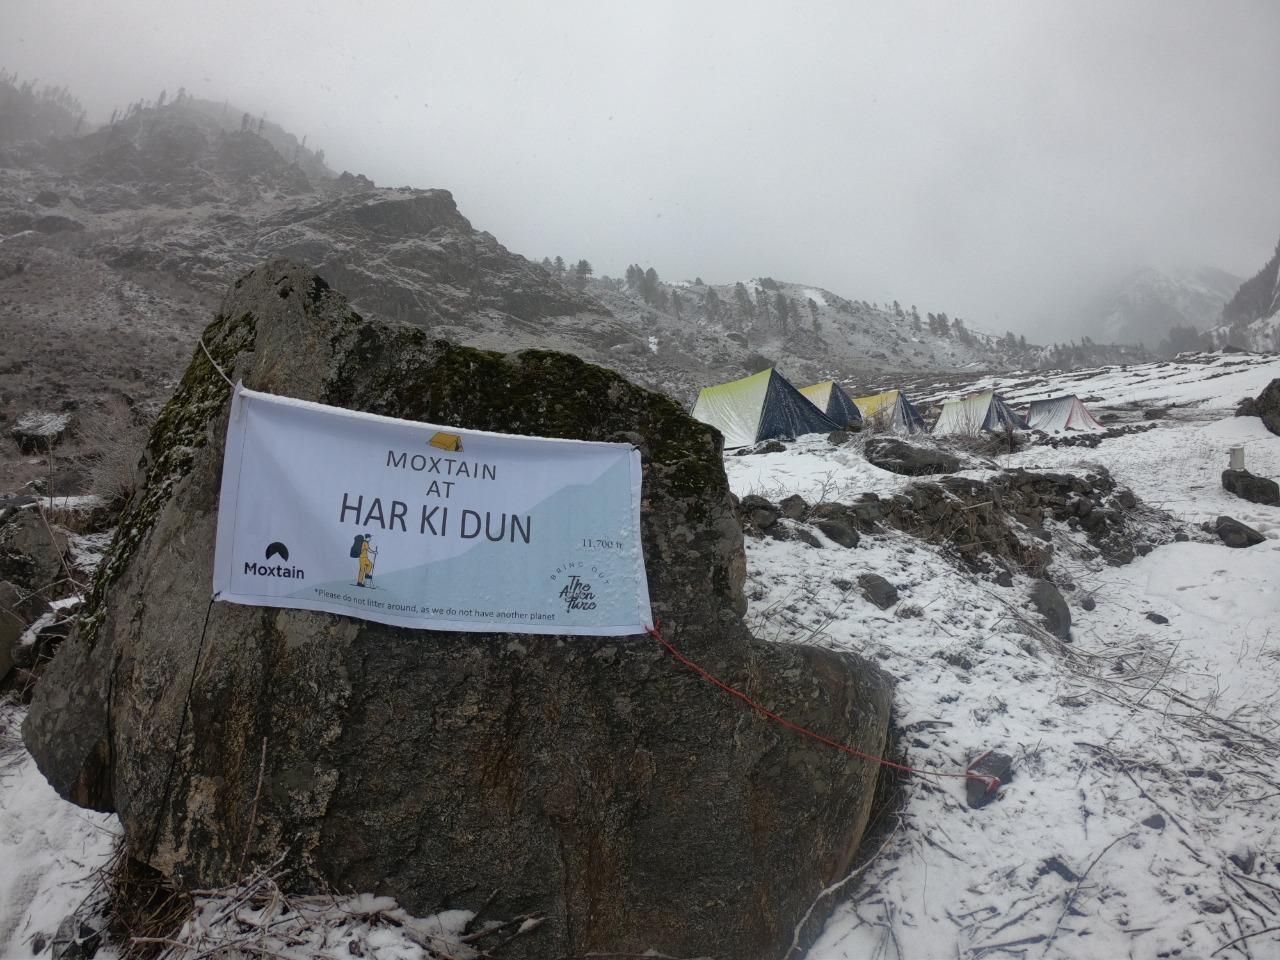 tents at har ki dun campsite cover with snow